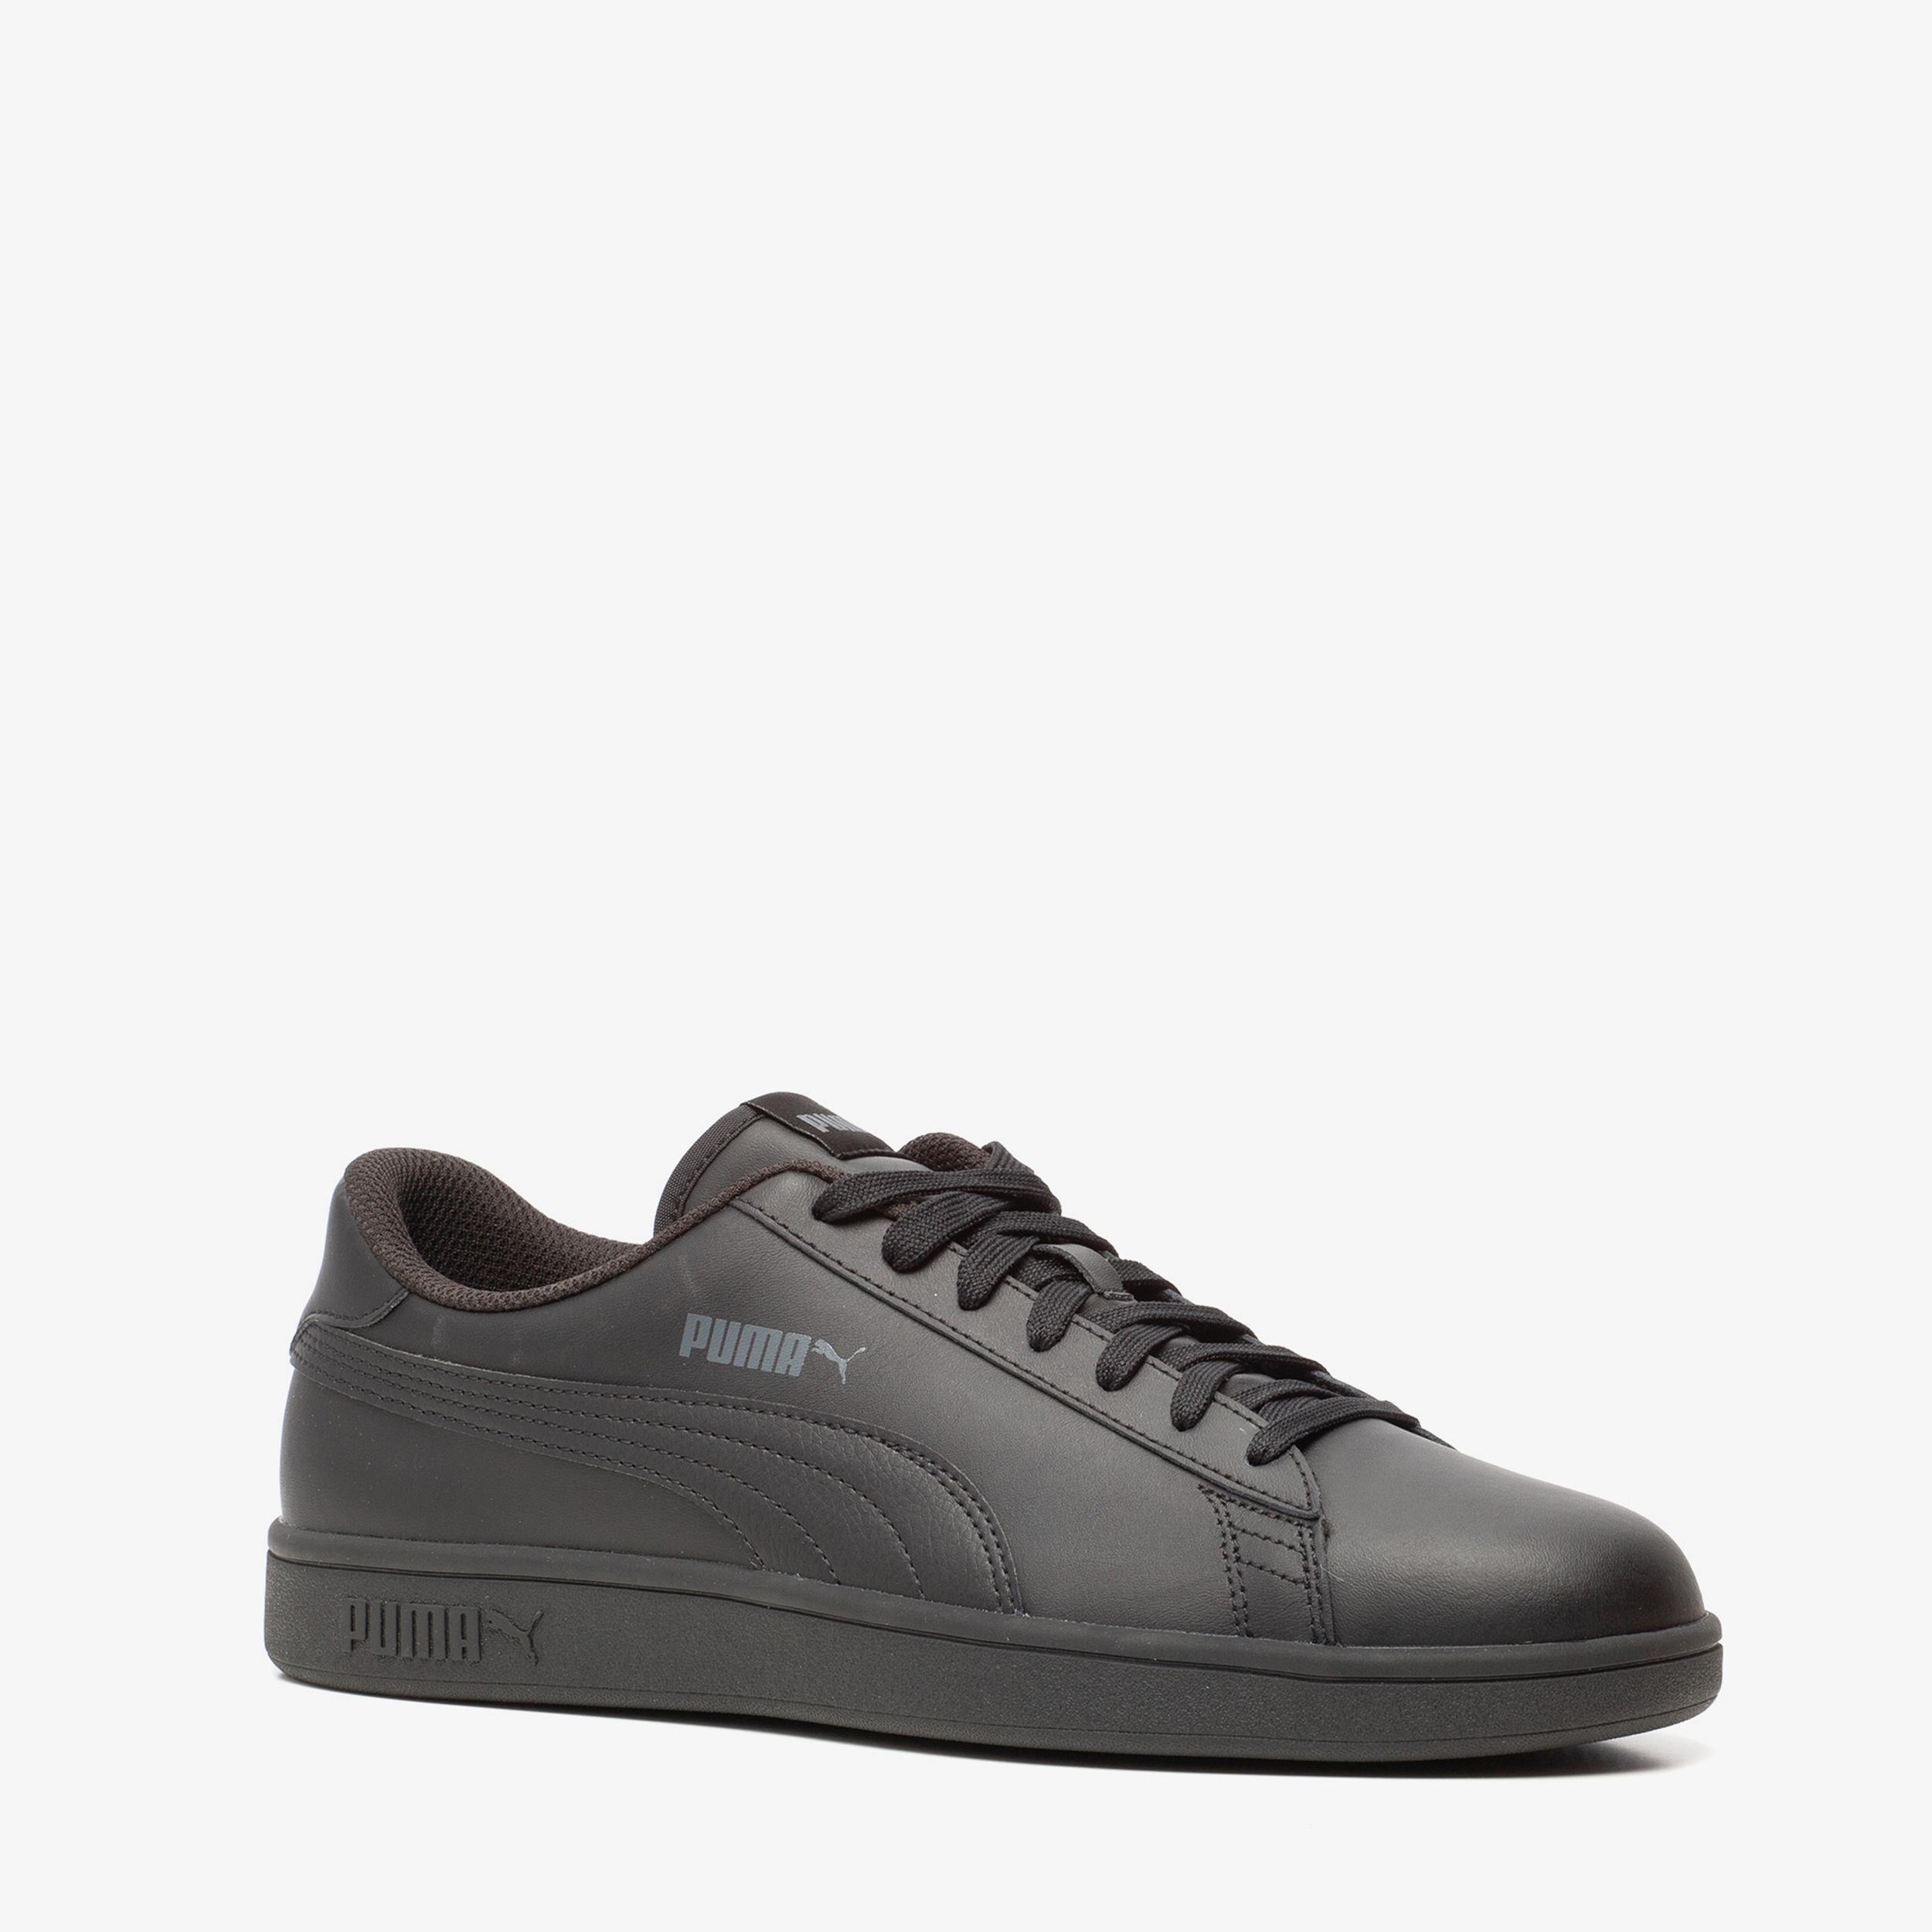 Puma Smash V2 L heren sneakers